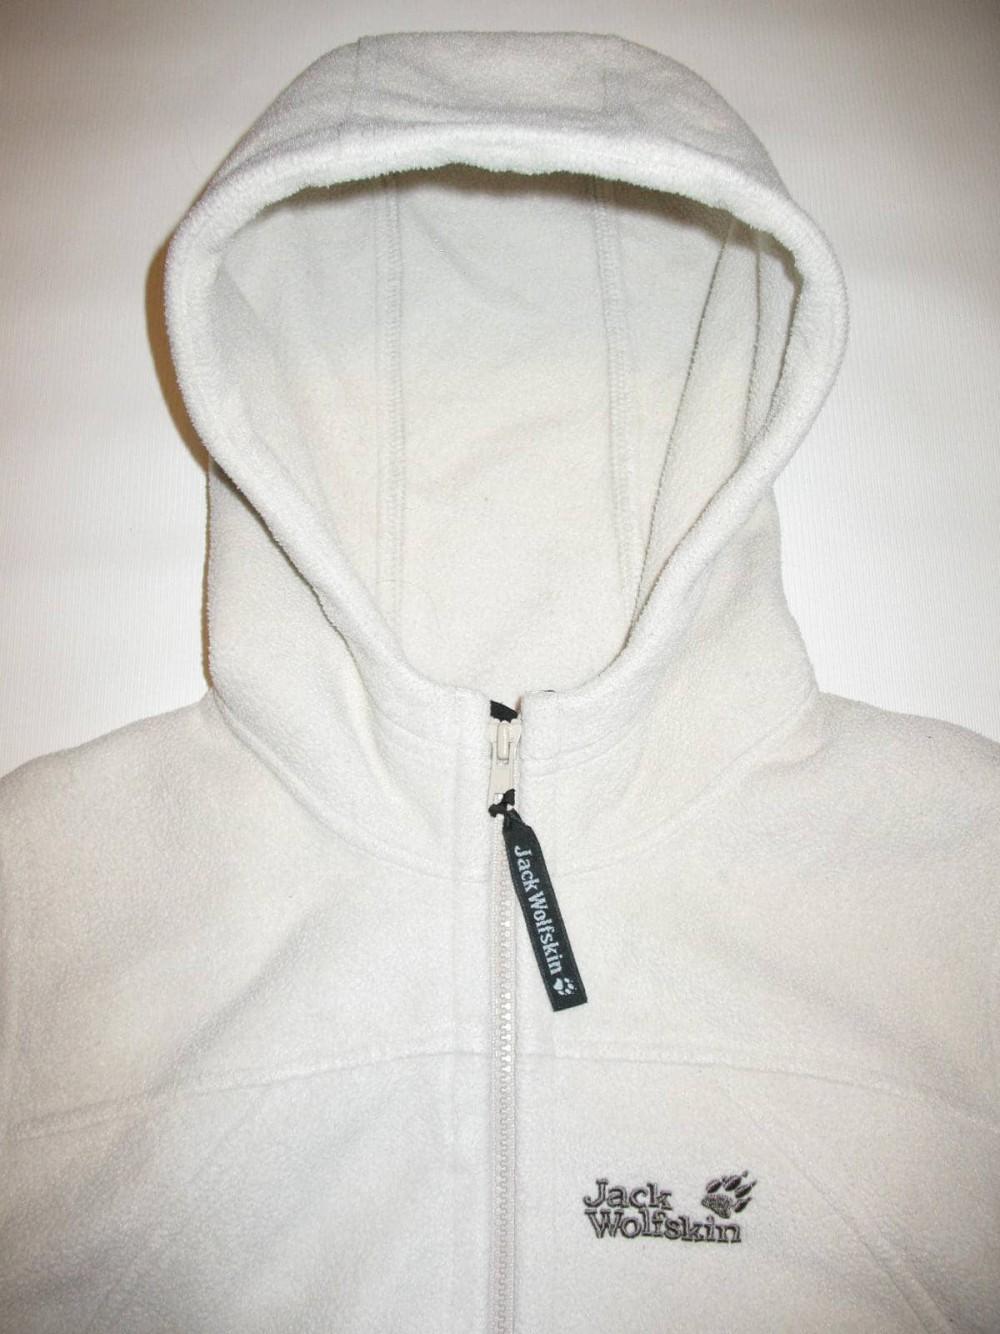 Куртка JACK WOLFSKIN luminario fleece jacket lady (размер S/M) - 2